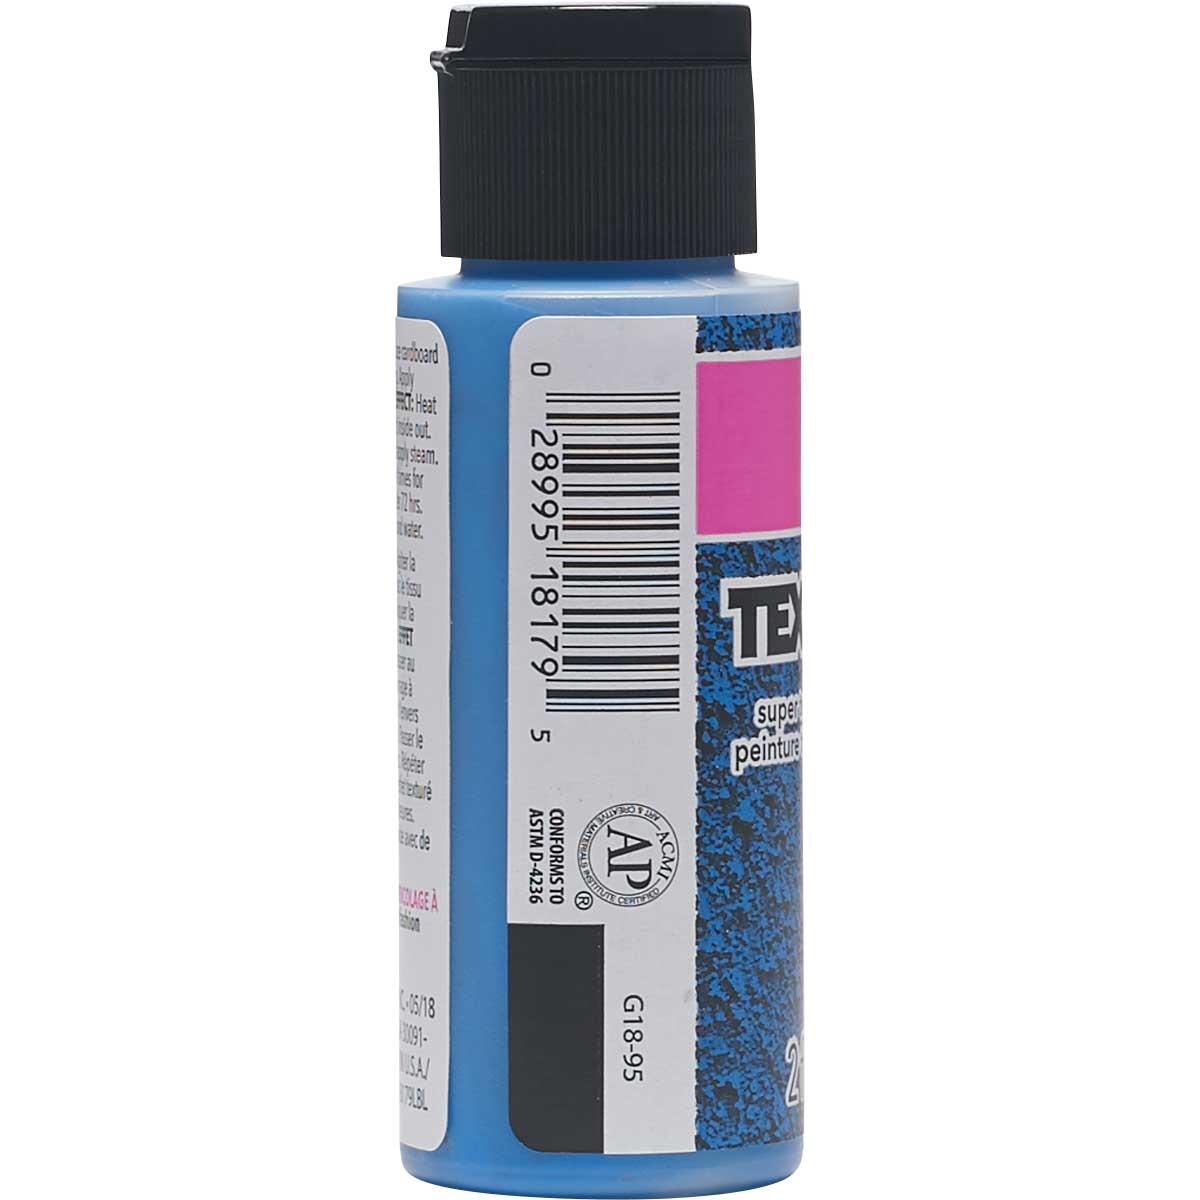 LaurDIY ® Texturific™ Fabric Paint - Do Re Mi, 2 oz.